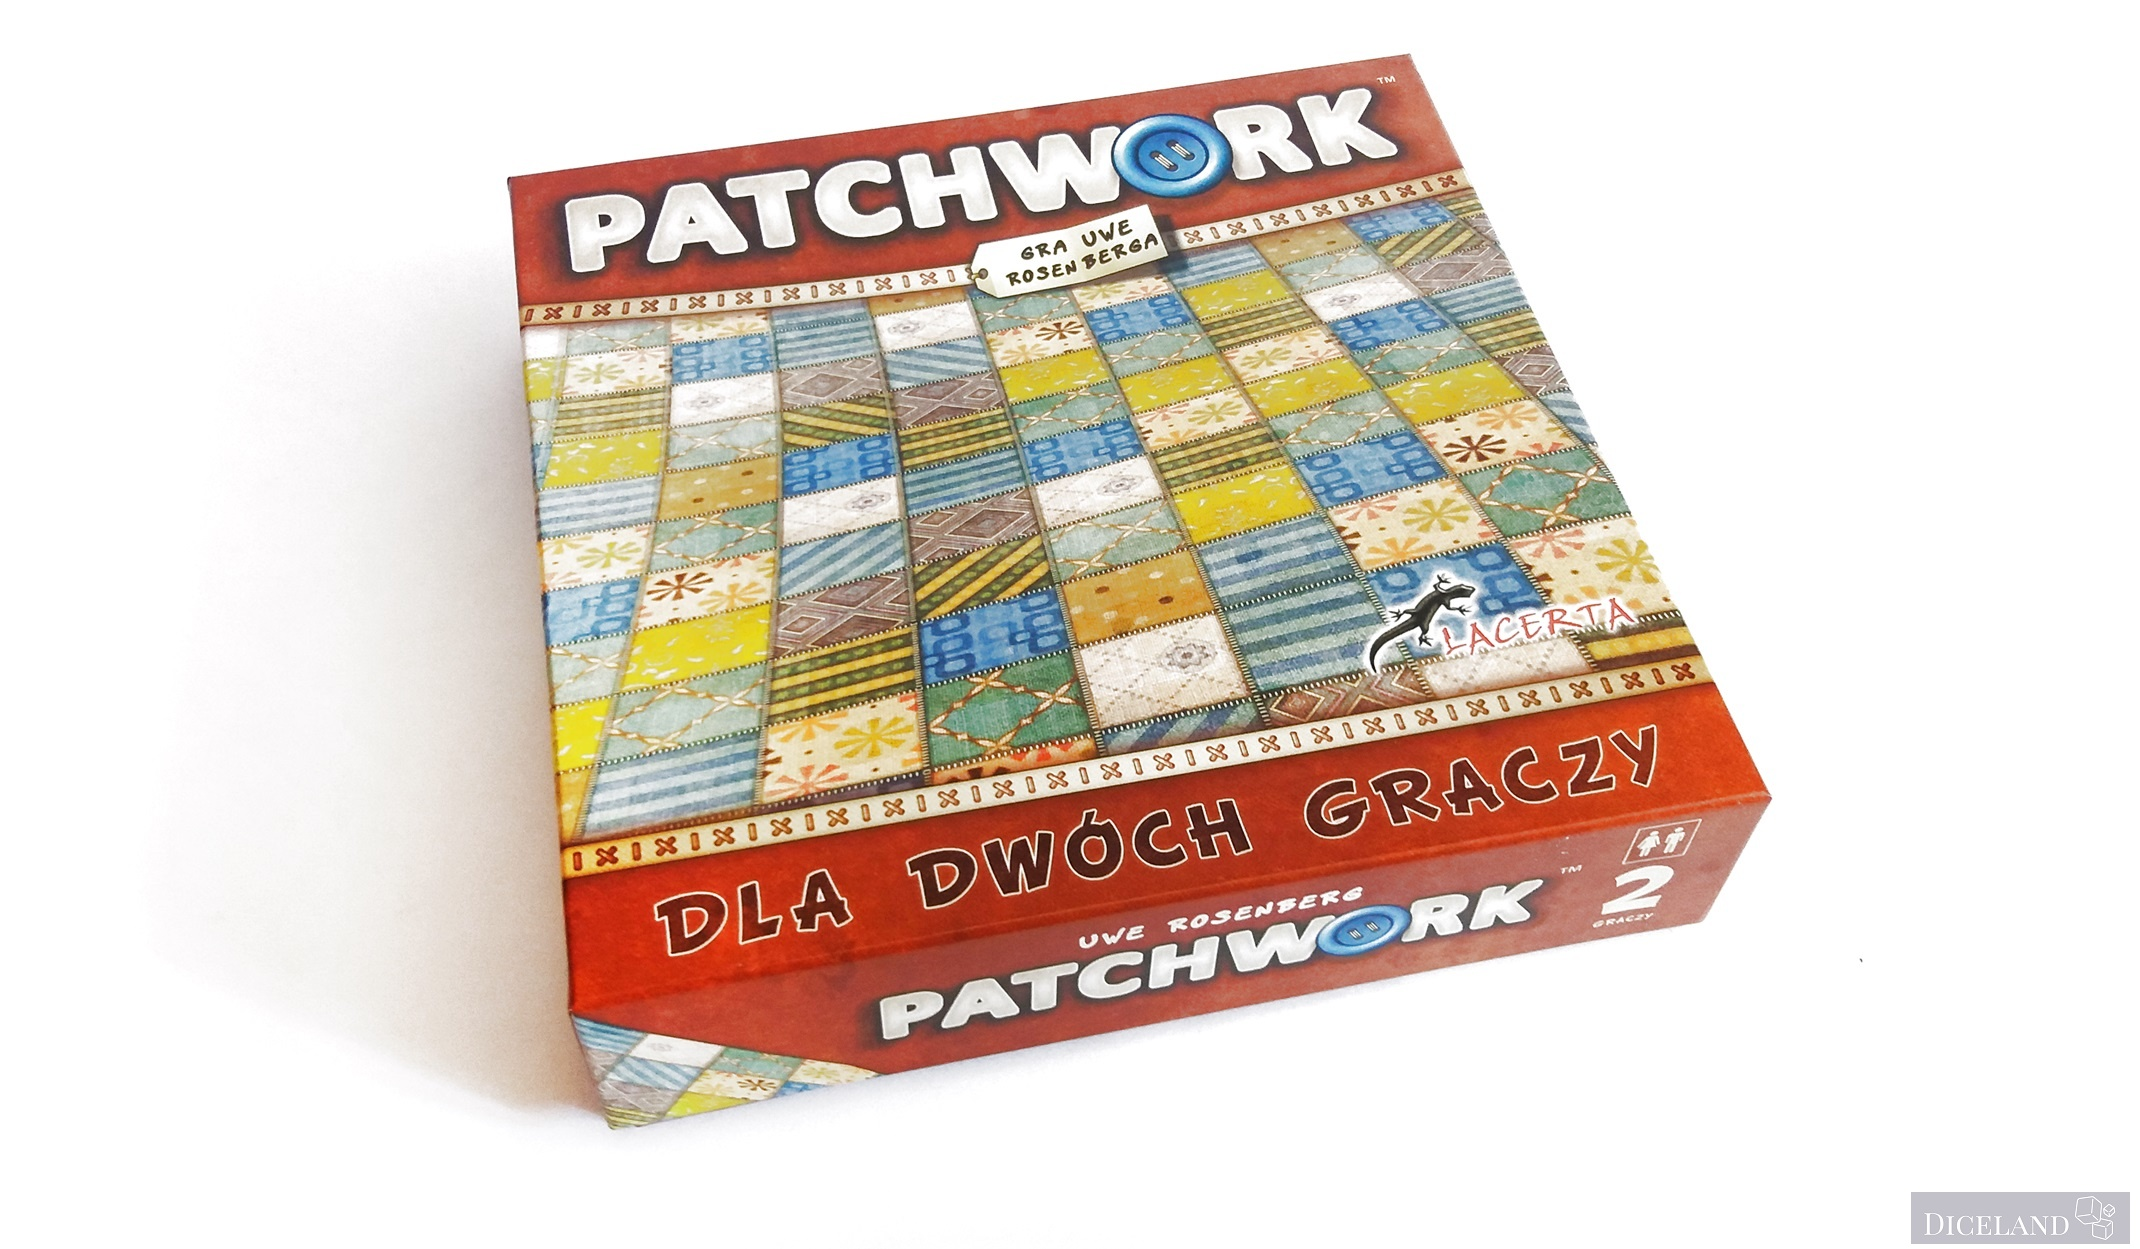 Patchwork 1 Recenzja #9 Patchwork